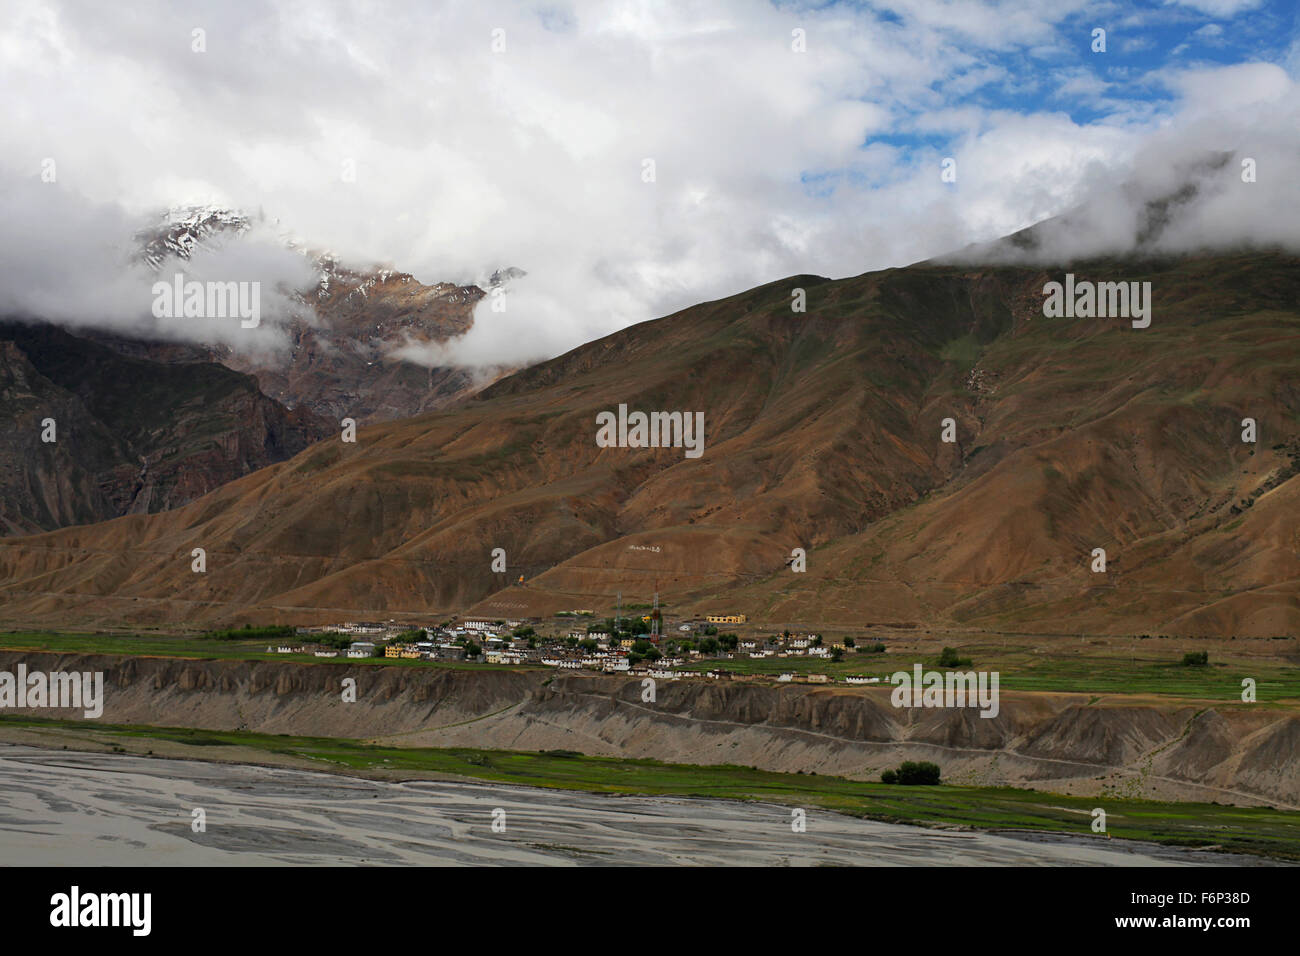 SPITI VALLEY - View of Rangarik village, Himachal Pradesh, India - Stock Image